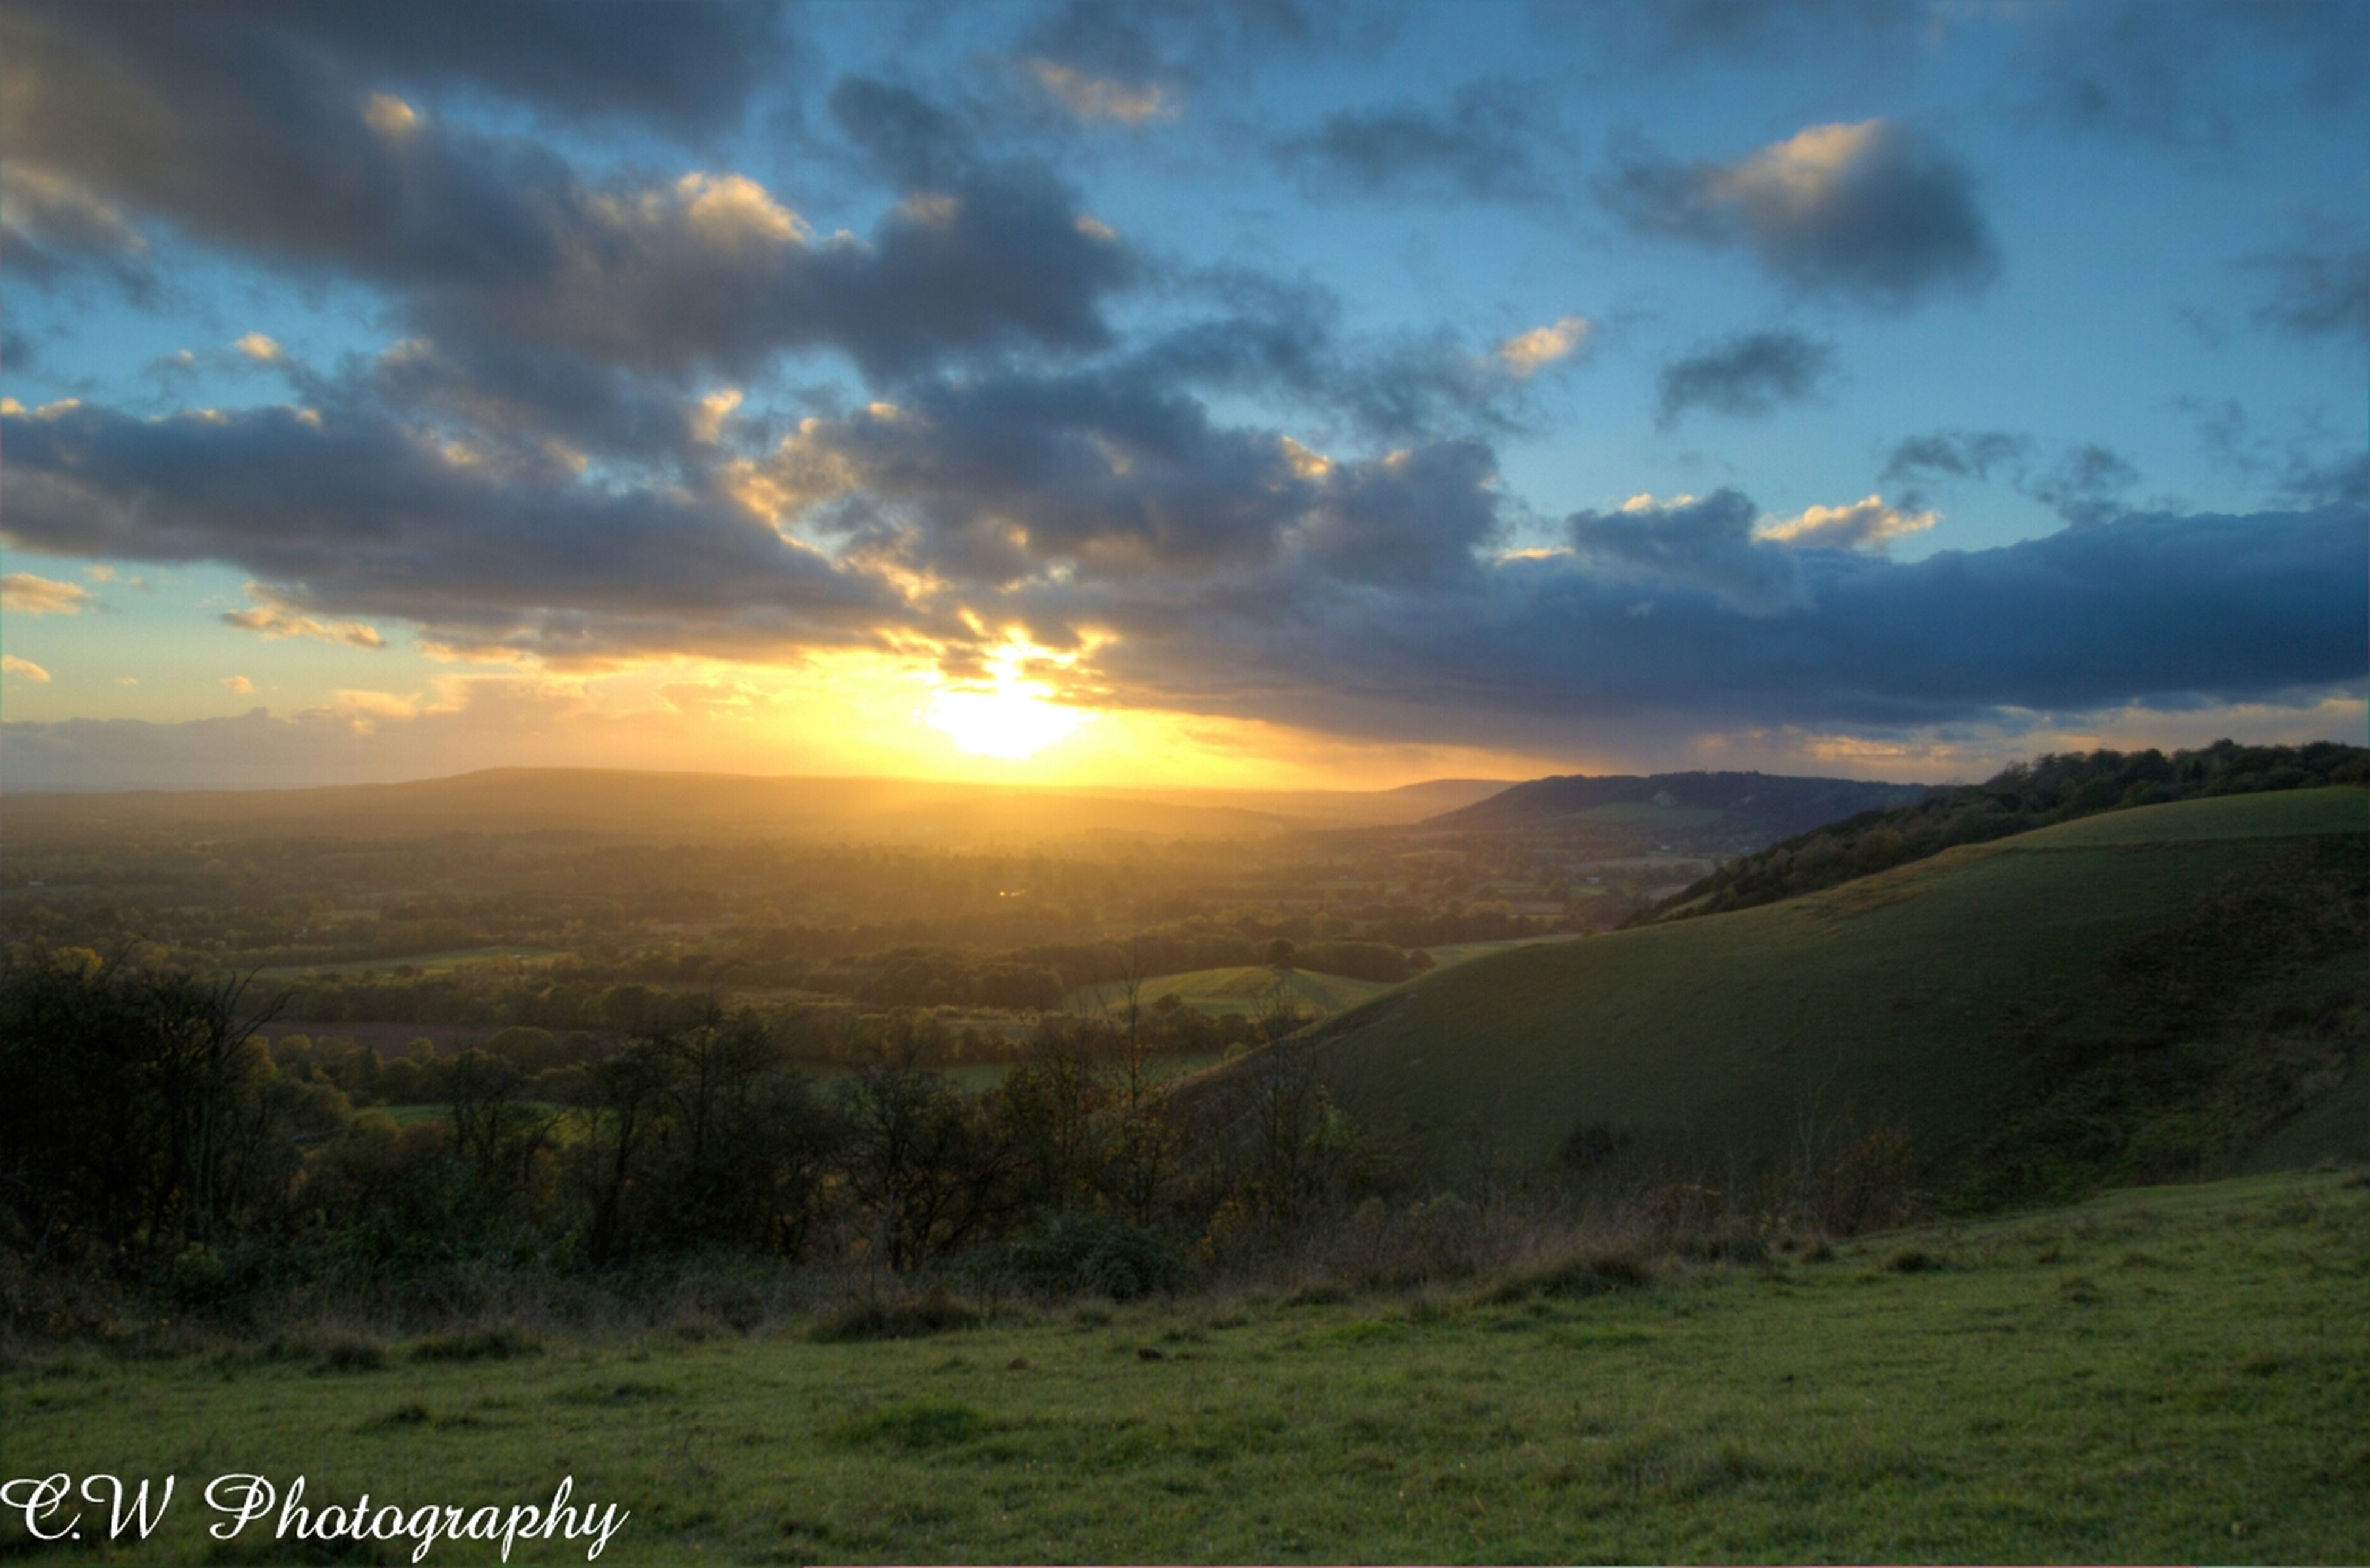 Hdr Edit Landscape Photography Sunset #sun #clouds #skylovers #sky #nature #beautifulinnature #naturalbeauty #photography #landscape Eye Em Nature Lover